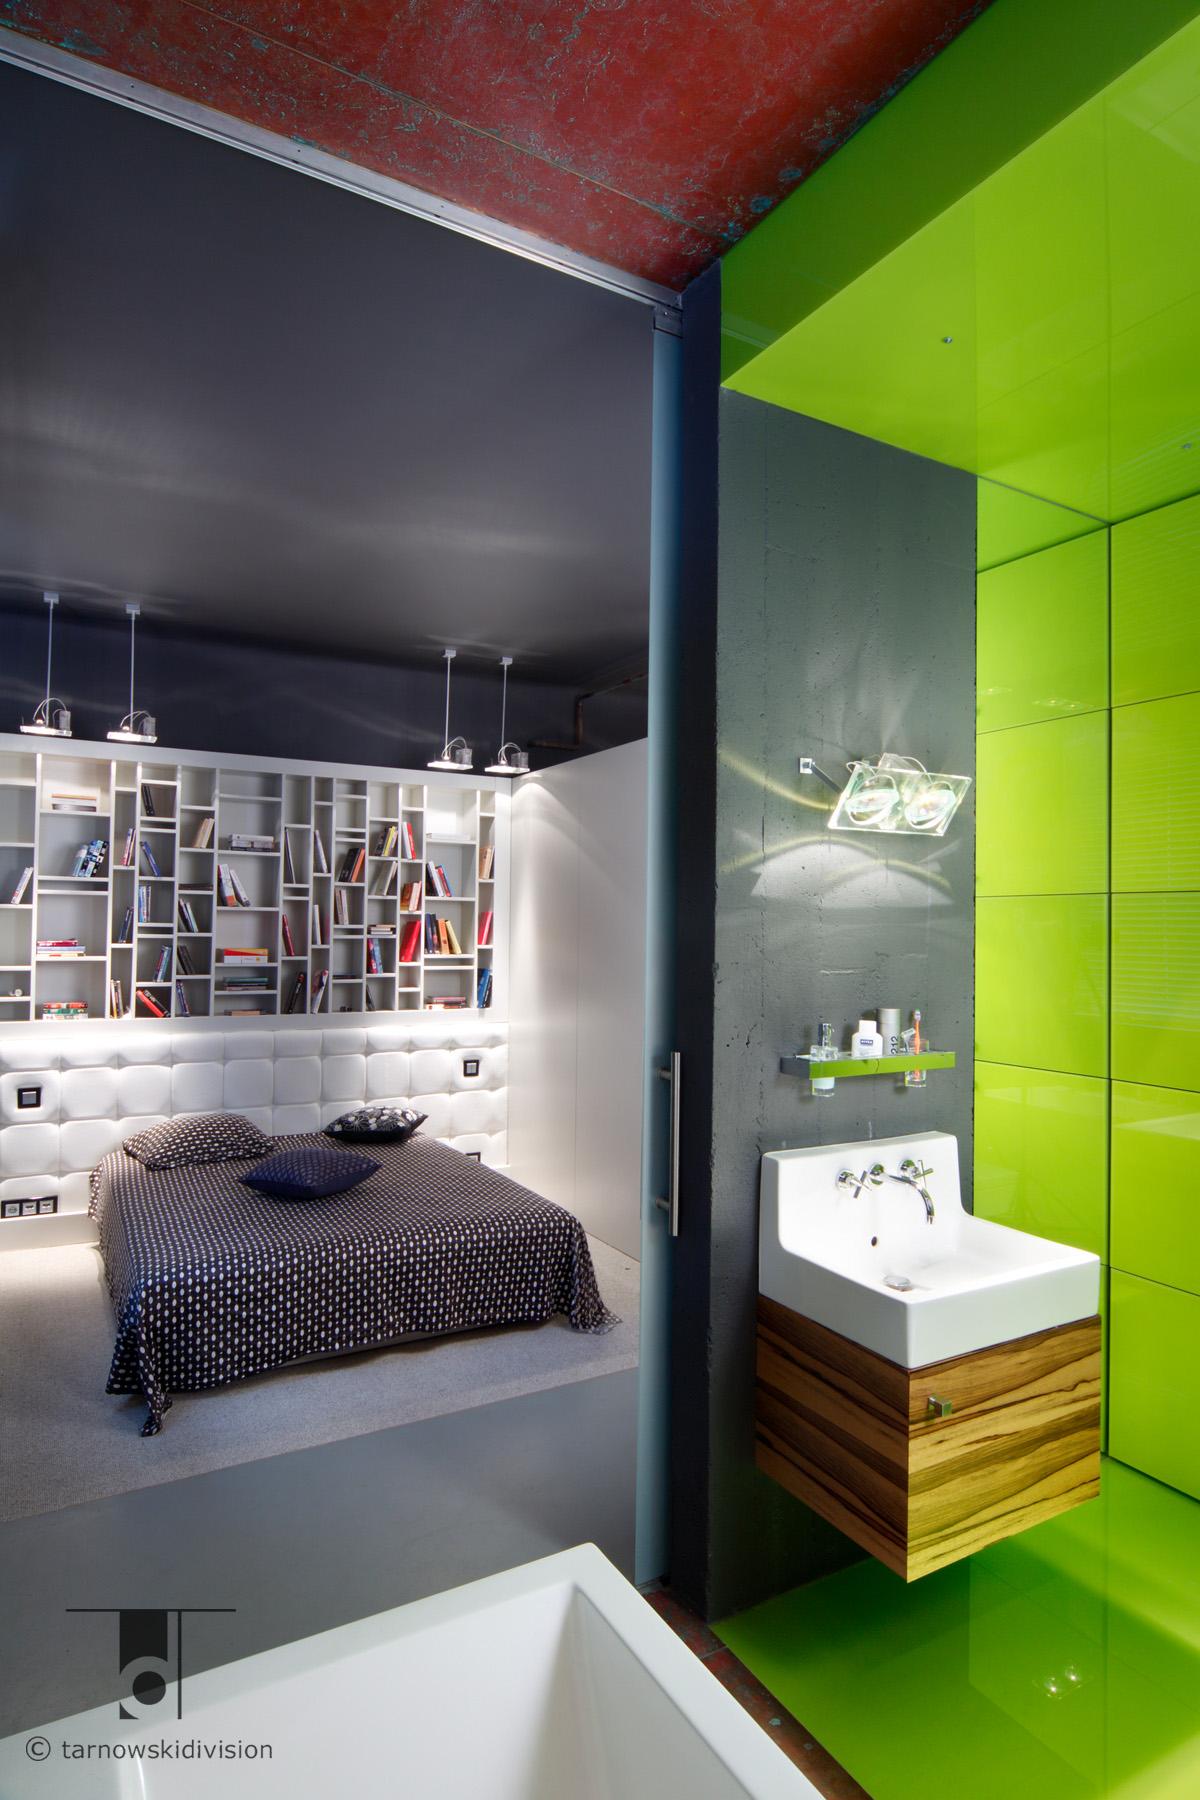 ekstrawagancka łazienka nowoczesna projekt wnętrz łazienki kolor modern ekstravagant bathroom interior_tarnowski division